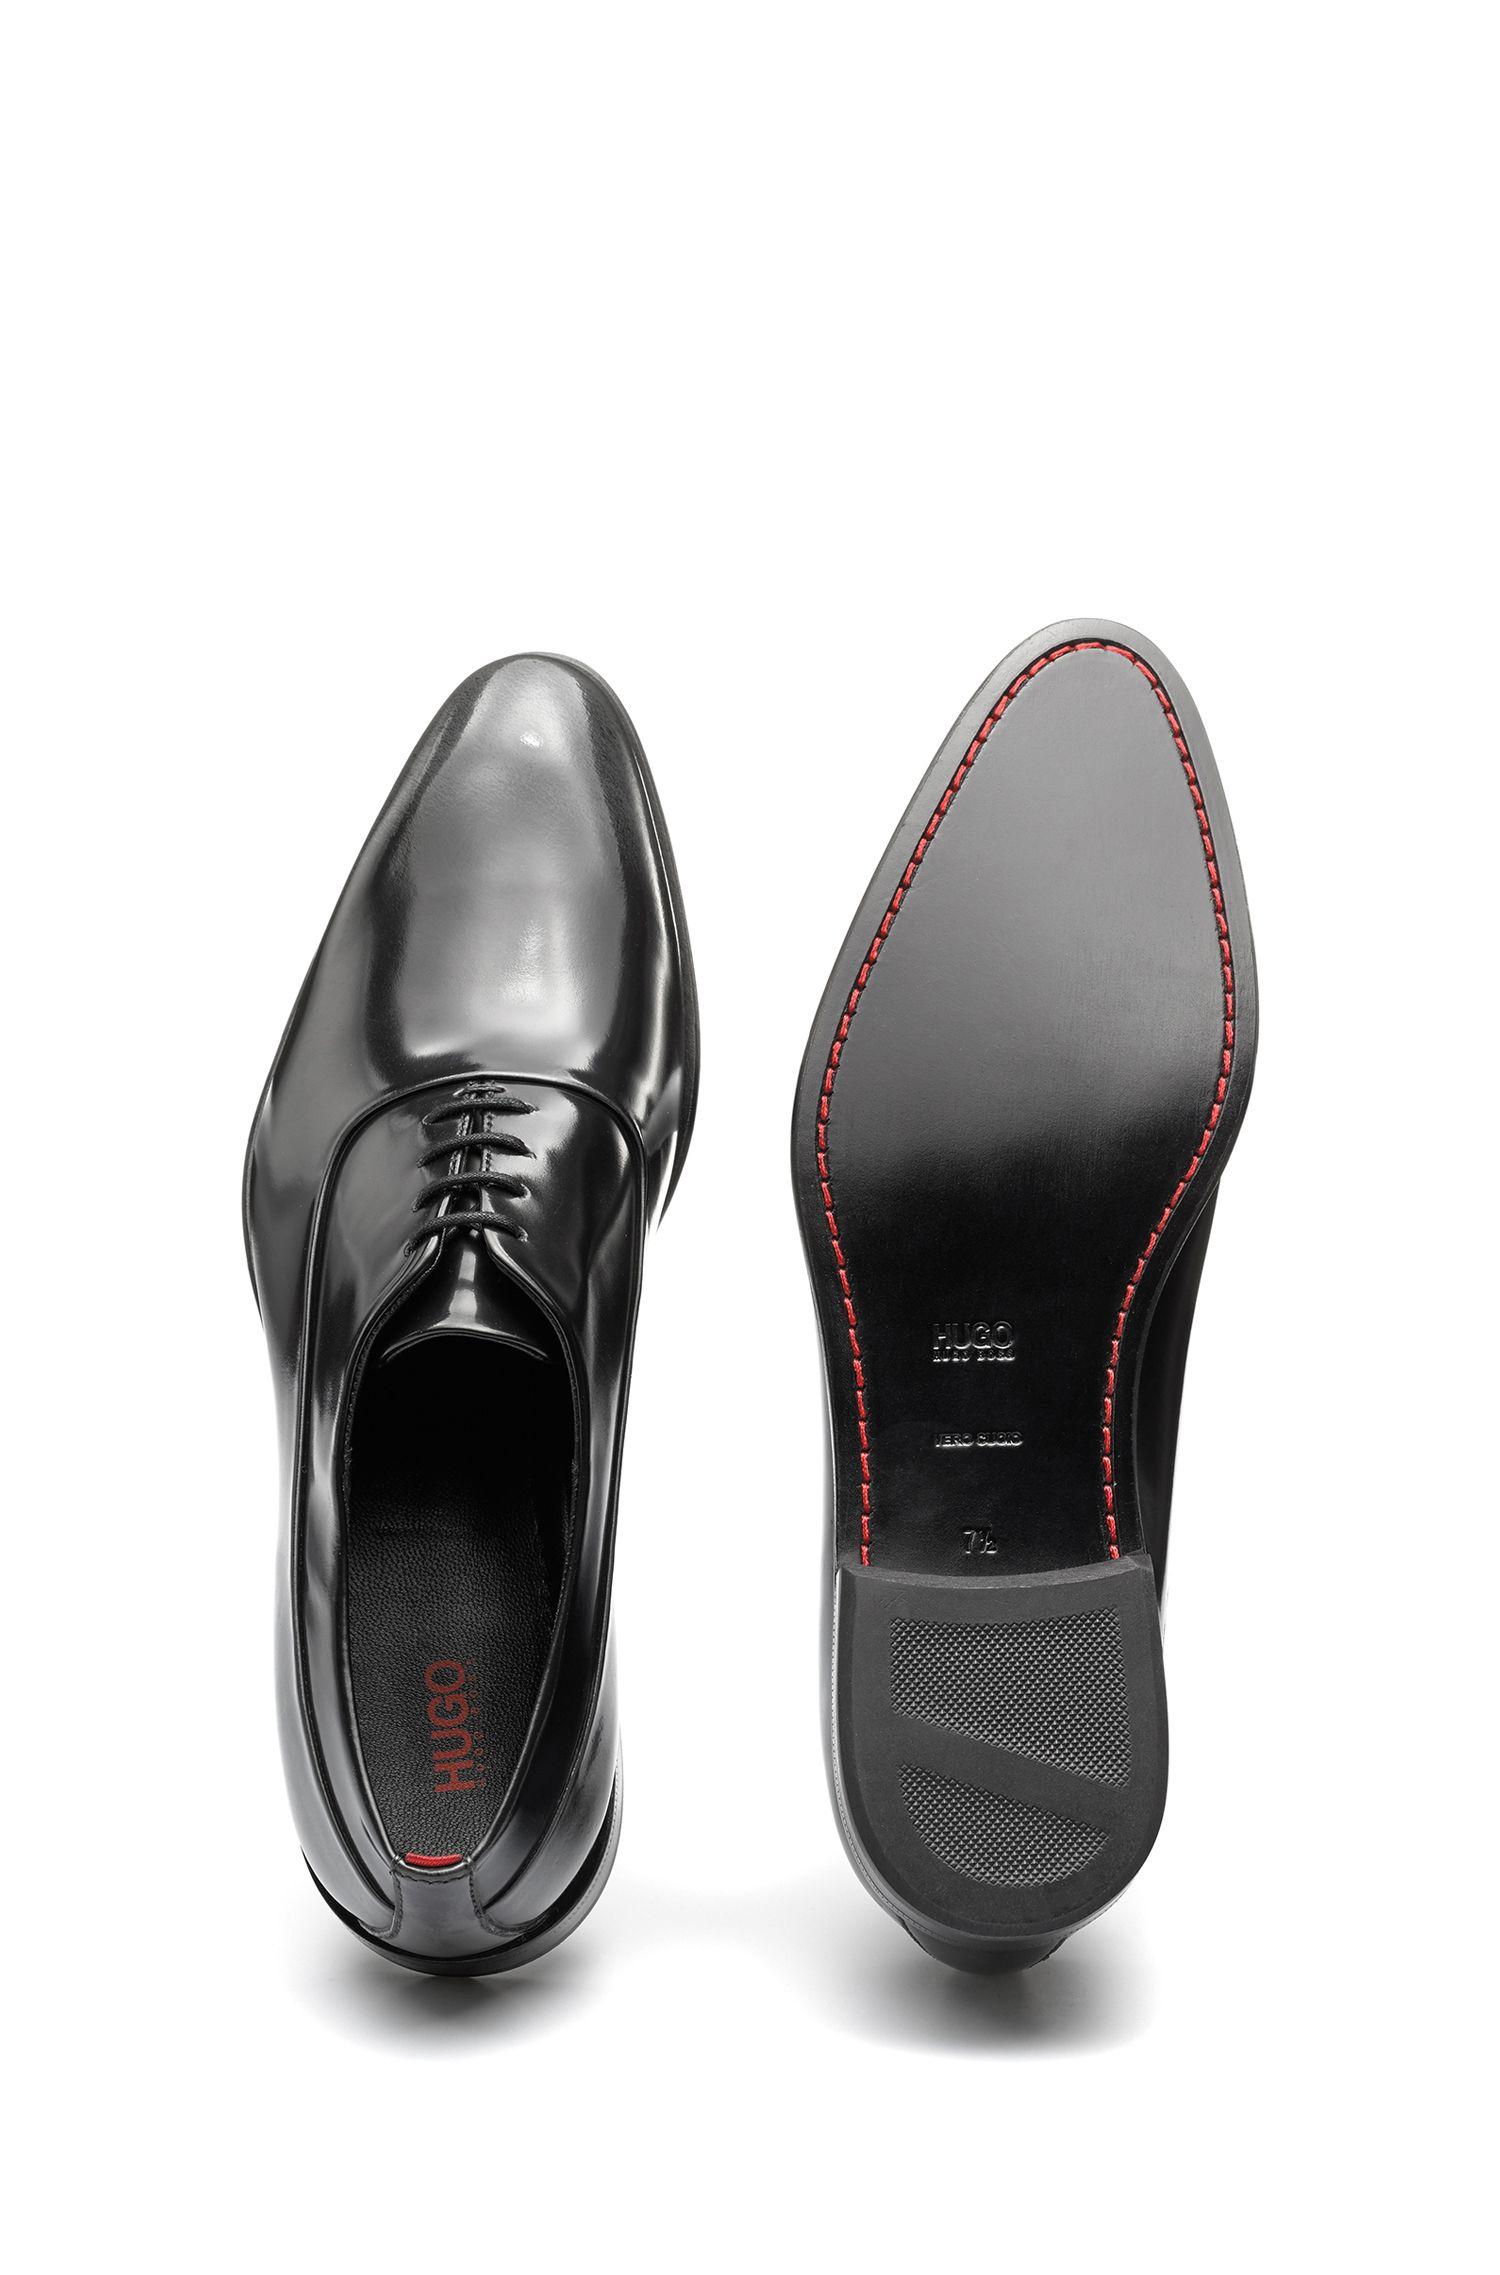 Chaussures Oxford en cuir brossé deux tons195.00HUGO BOSS j3QK7pj5